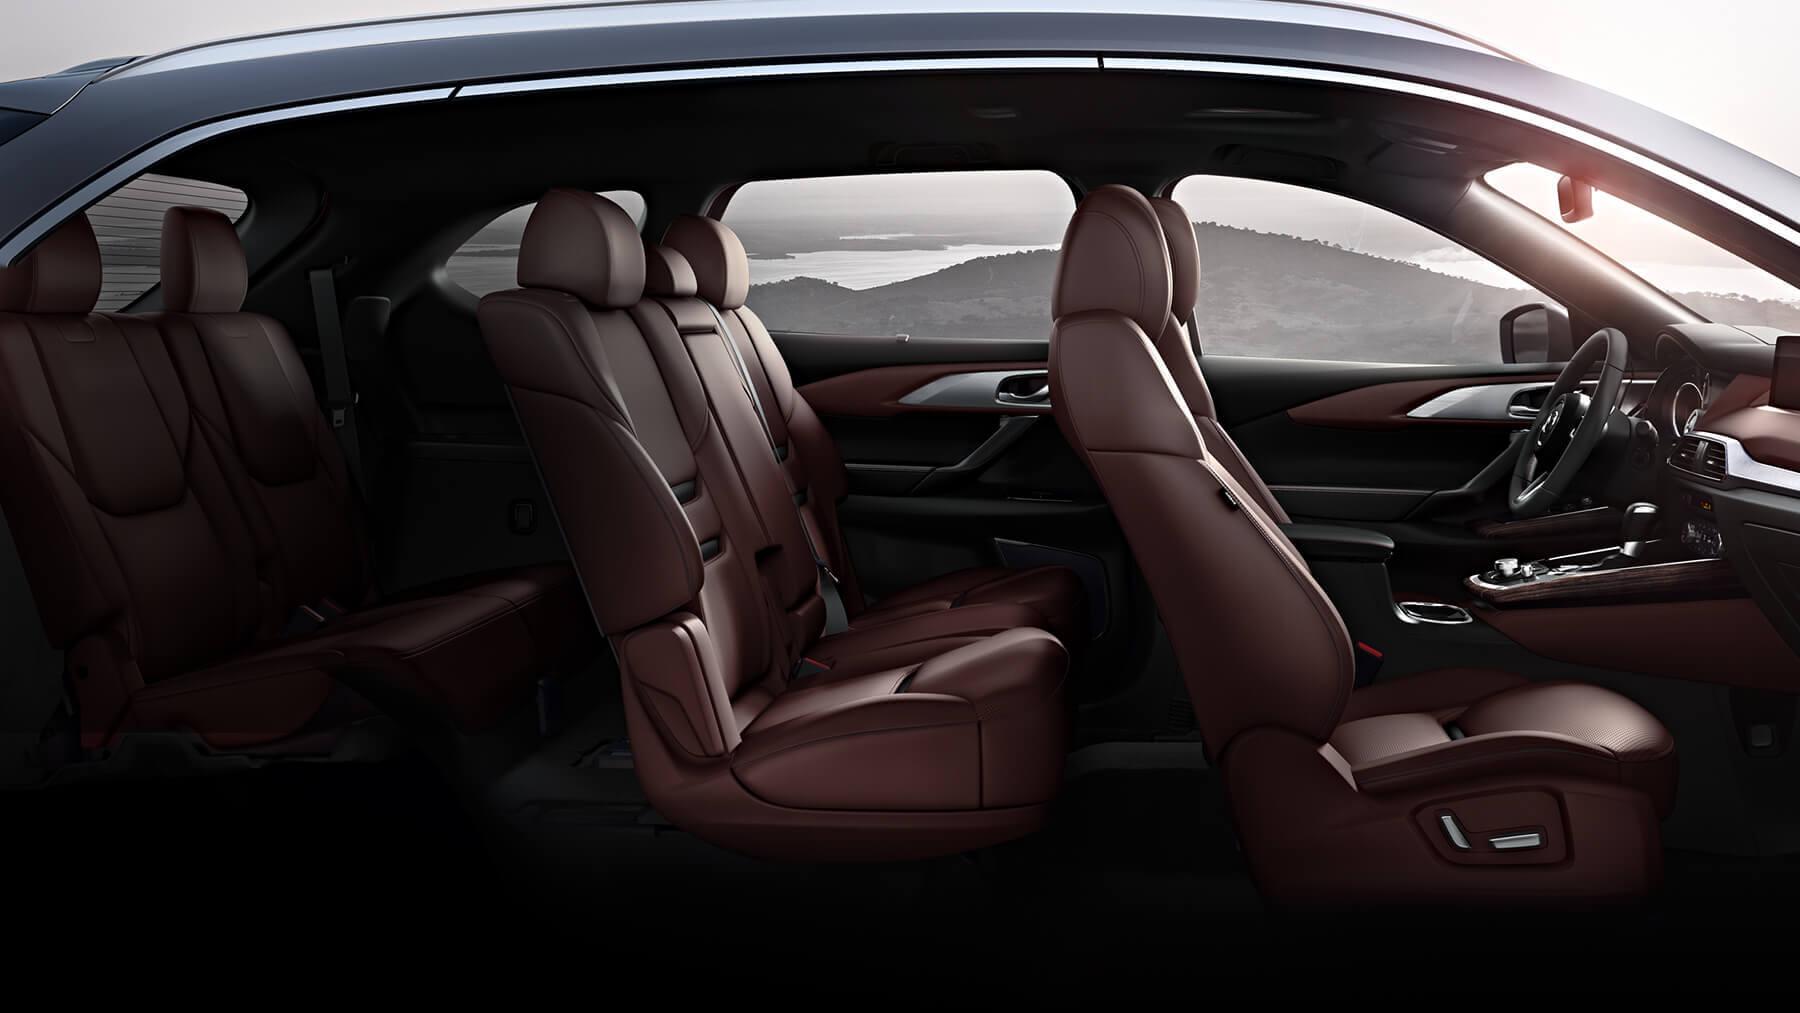 2017 Mazda CX-9 Seats